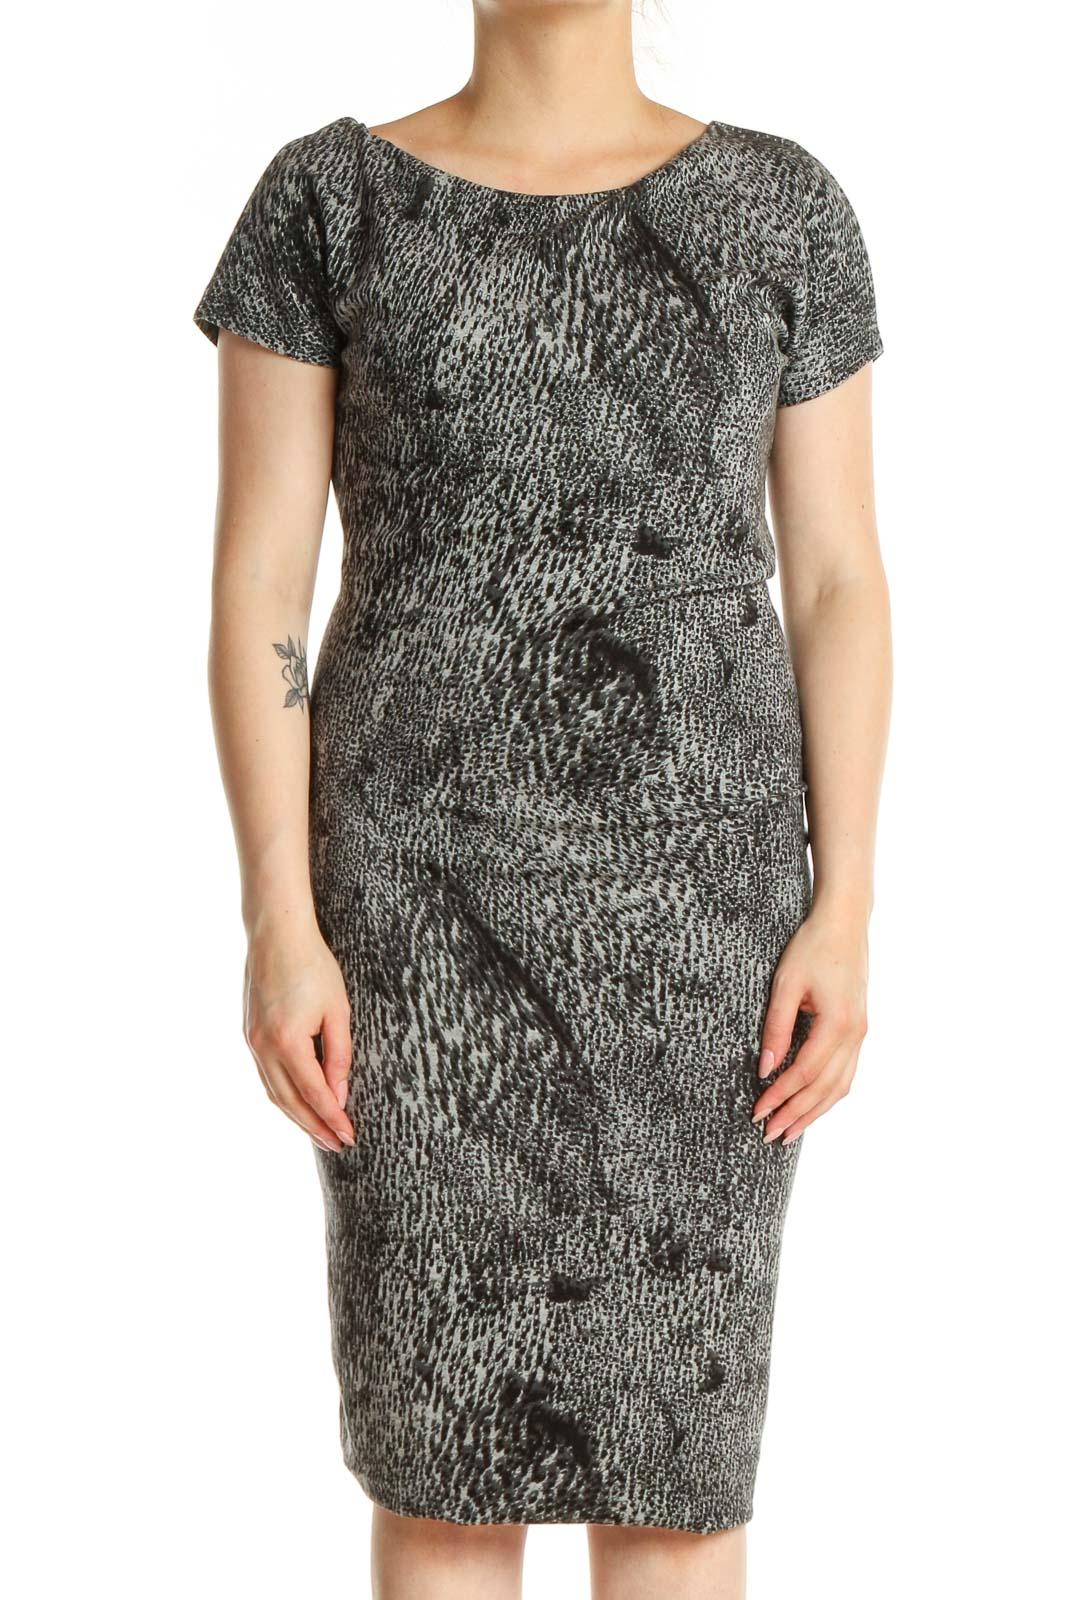 Gray Printed Sheath Dress Front